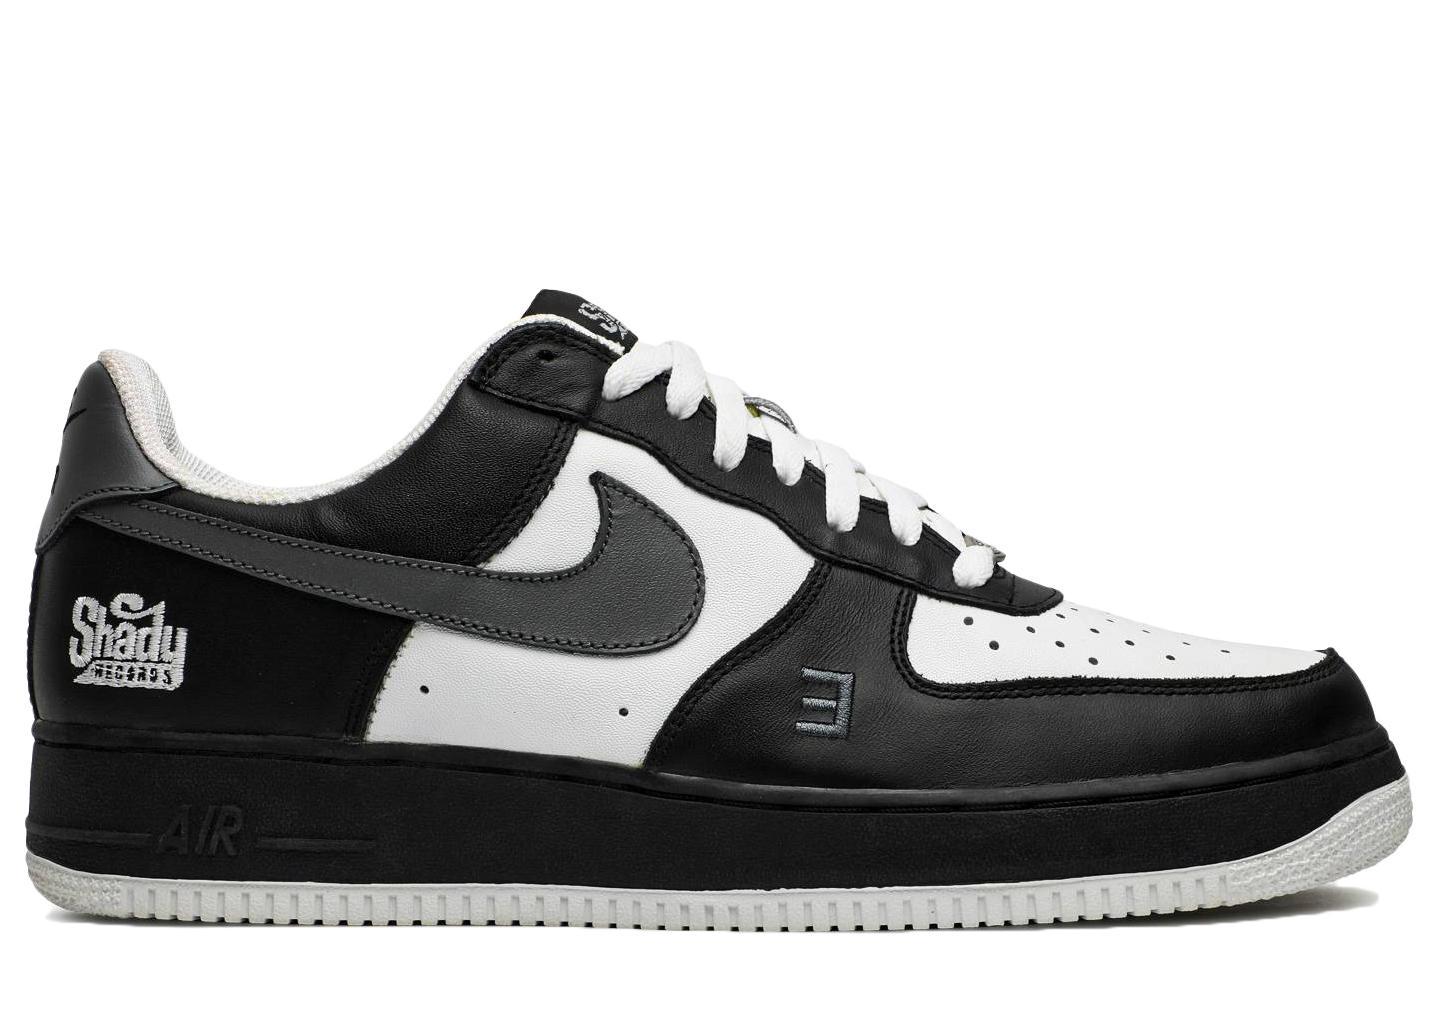 Nike Air Force 1 Low X Eminem 'shady